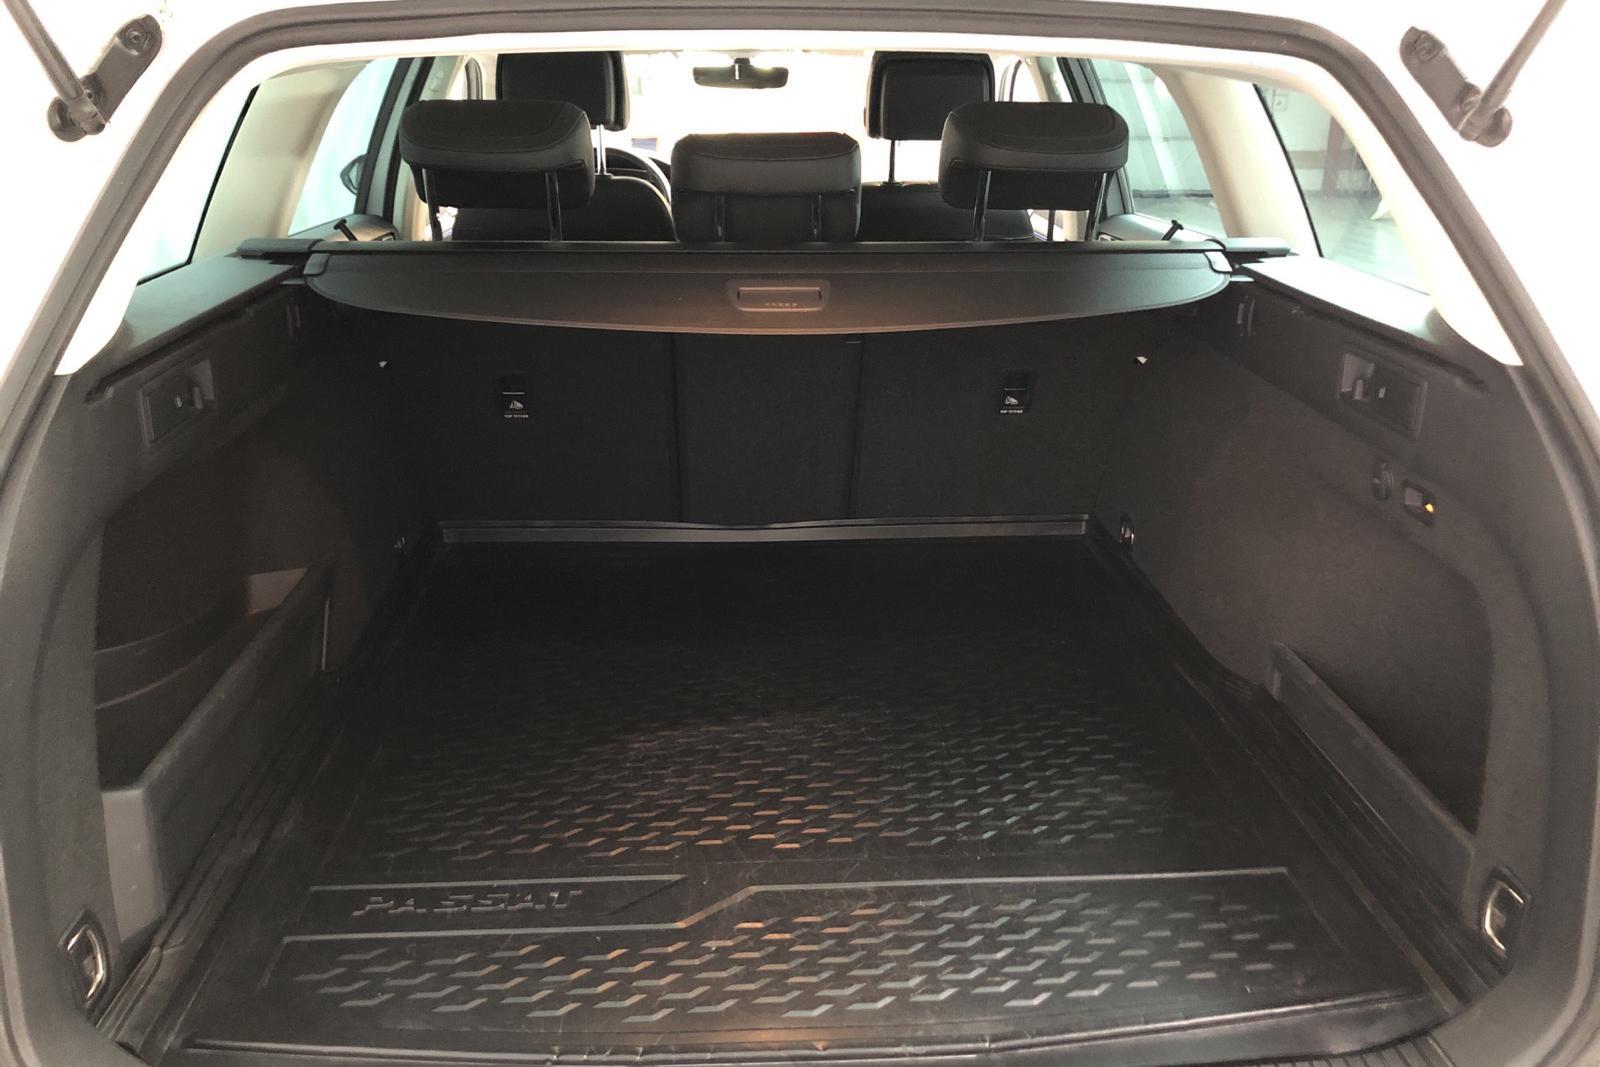 VW Passat 1.4 Plug-in-Hybrid Sportscombi (218hk) - 6 344 mil - Automat - vit - 2017